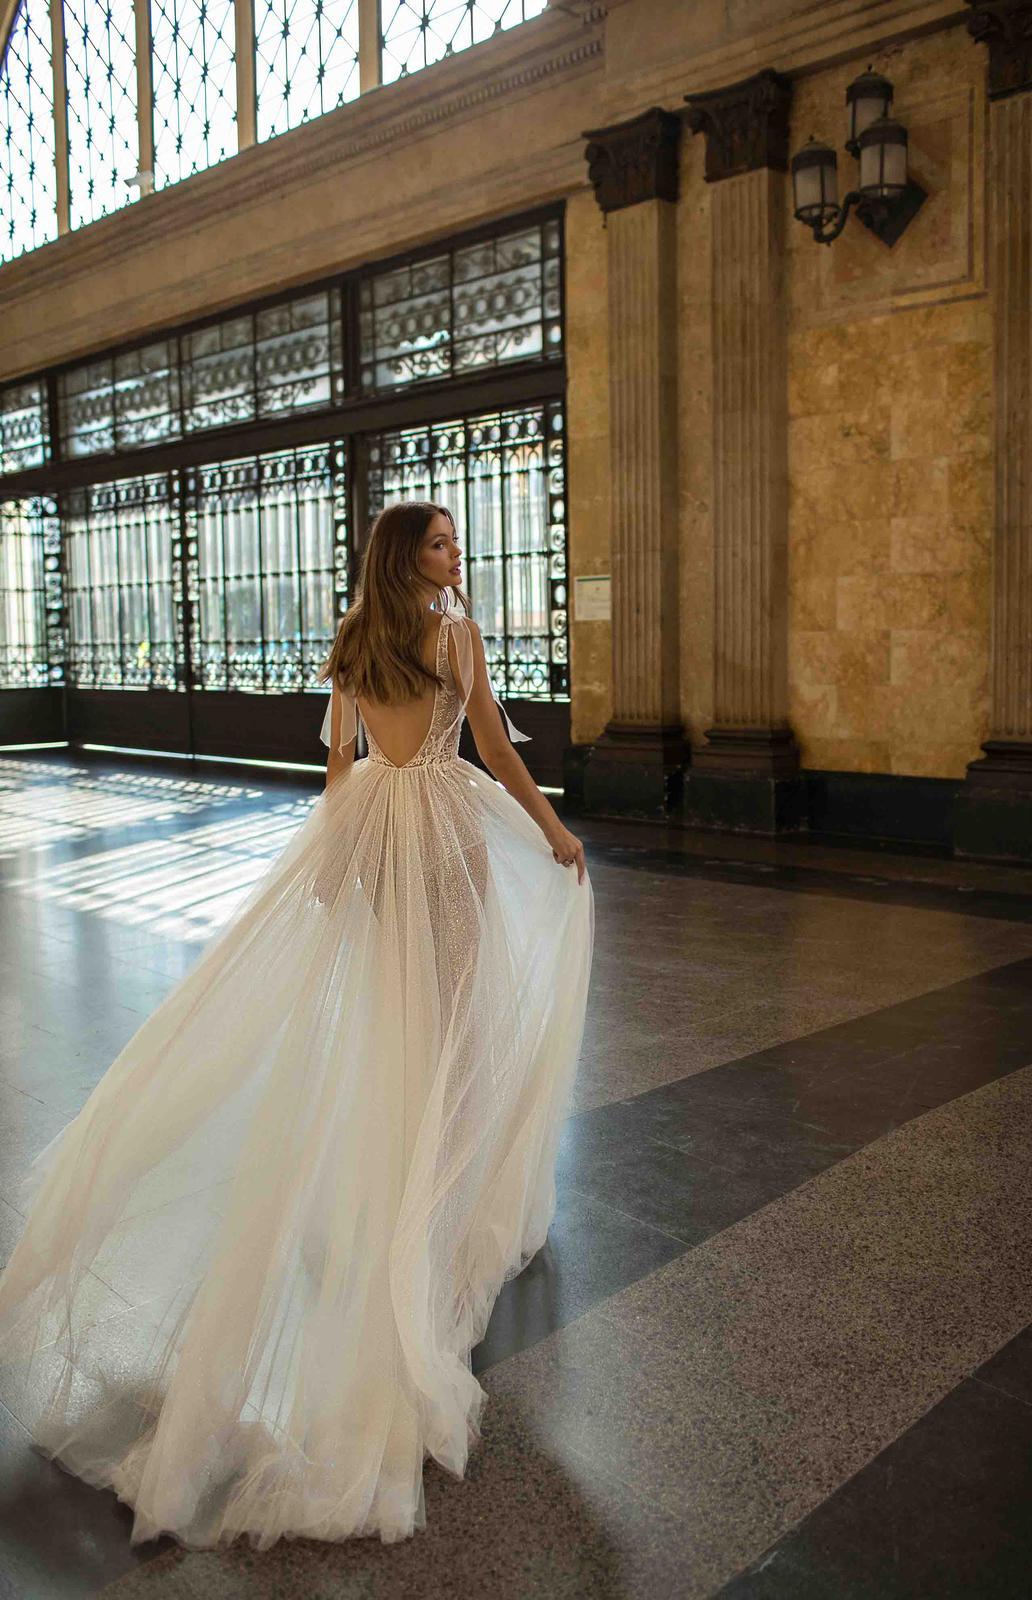 Muse by Berta * Svadobné šaty z kolekcií na rok 2019 - Obrázok č. 21